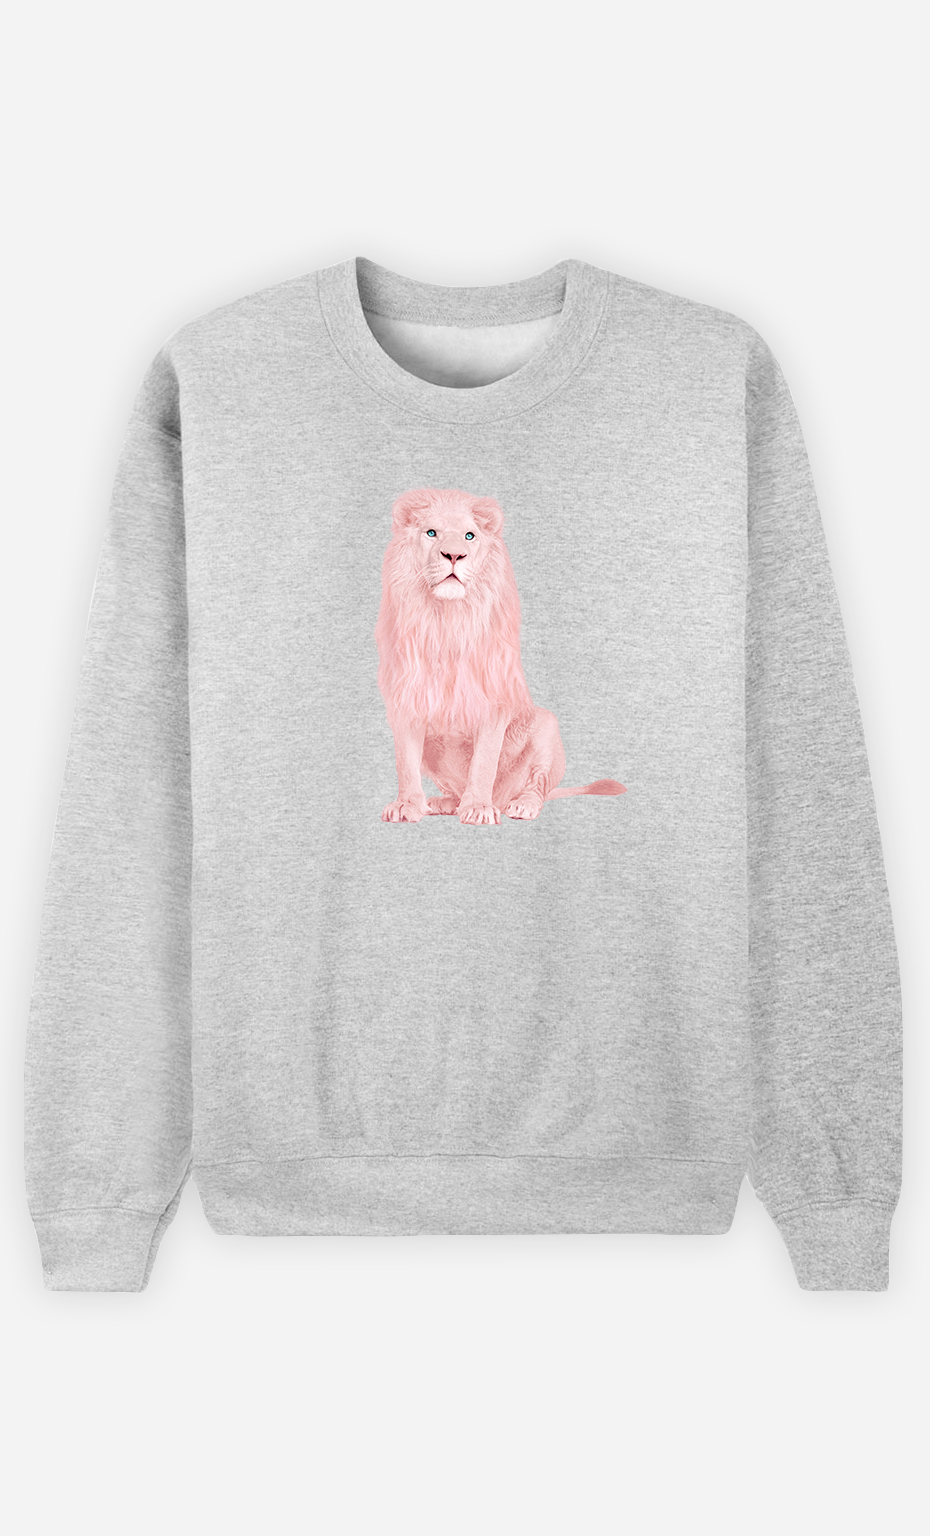 Sweatshirt Femme Pink Lion